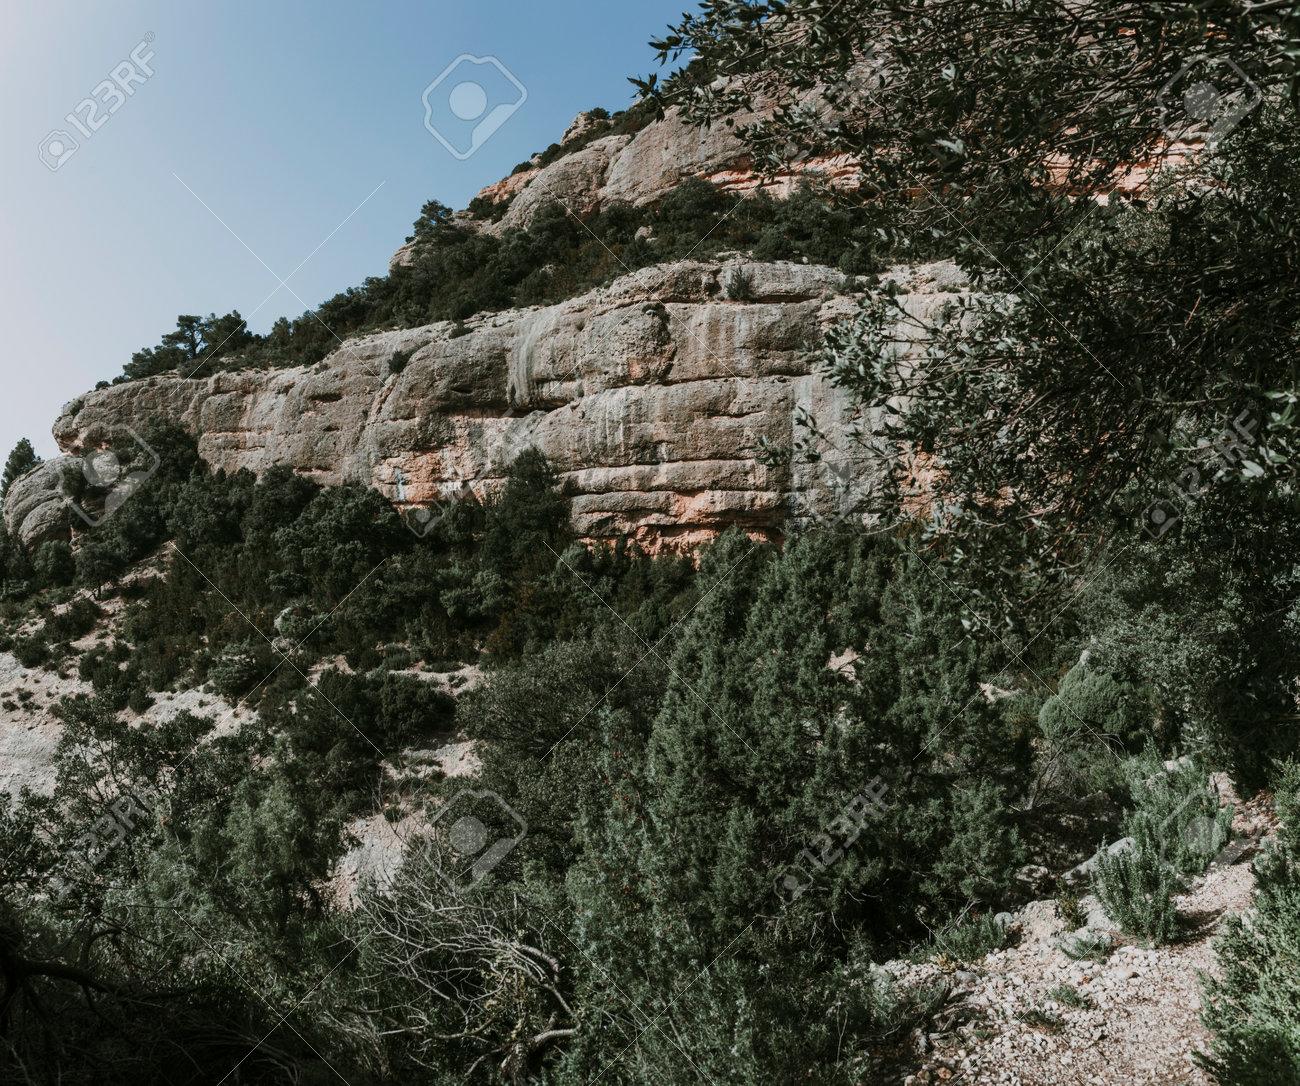 Path to Galera Peak. Teruel province. Spain - 166728544